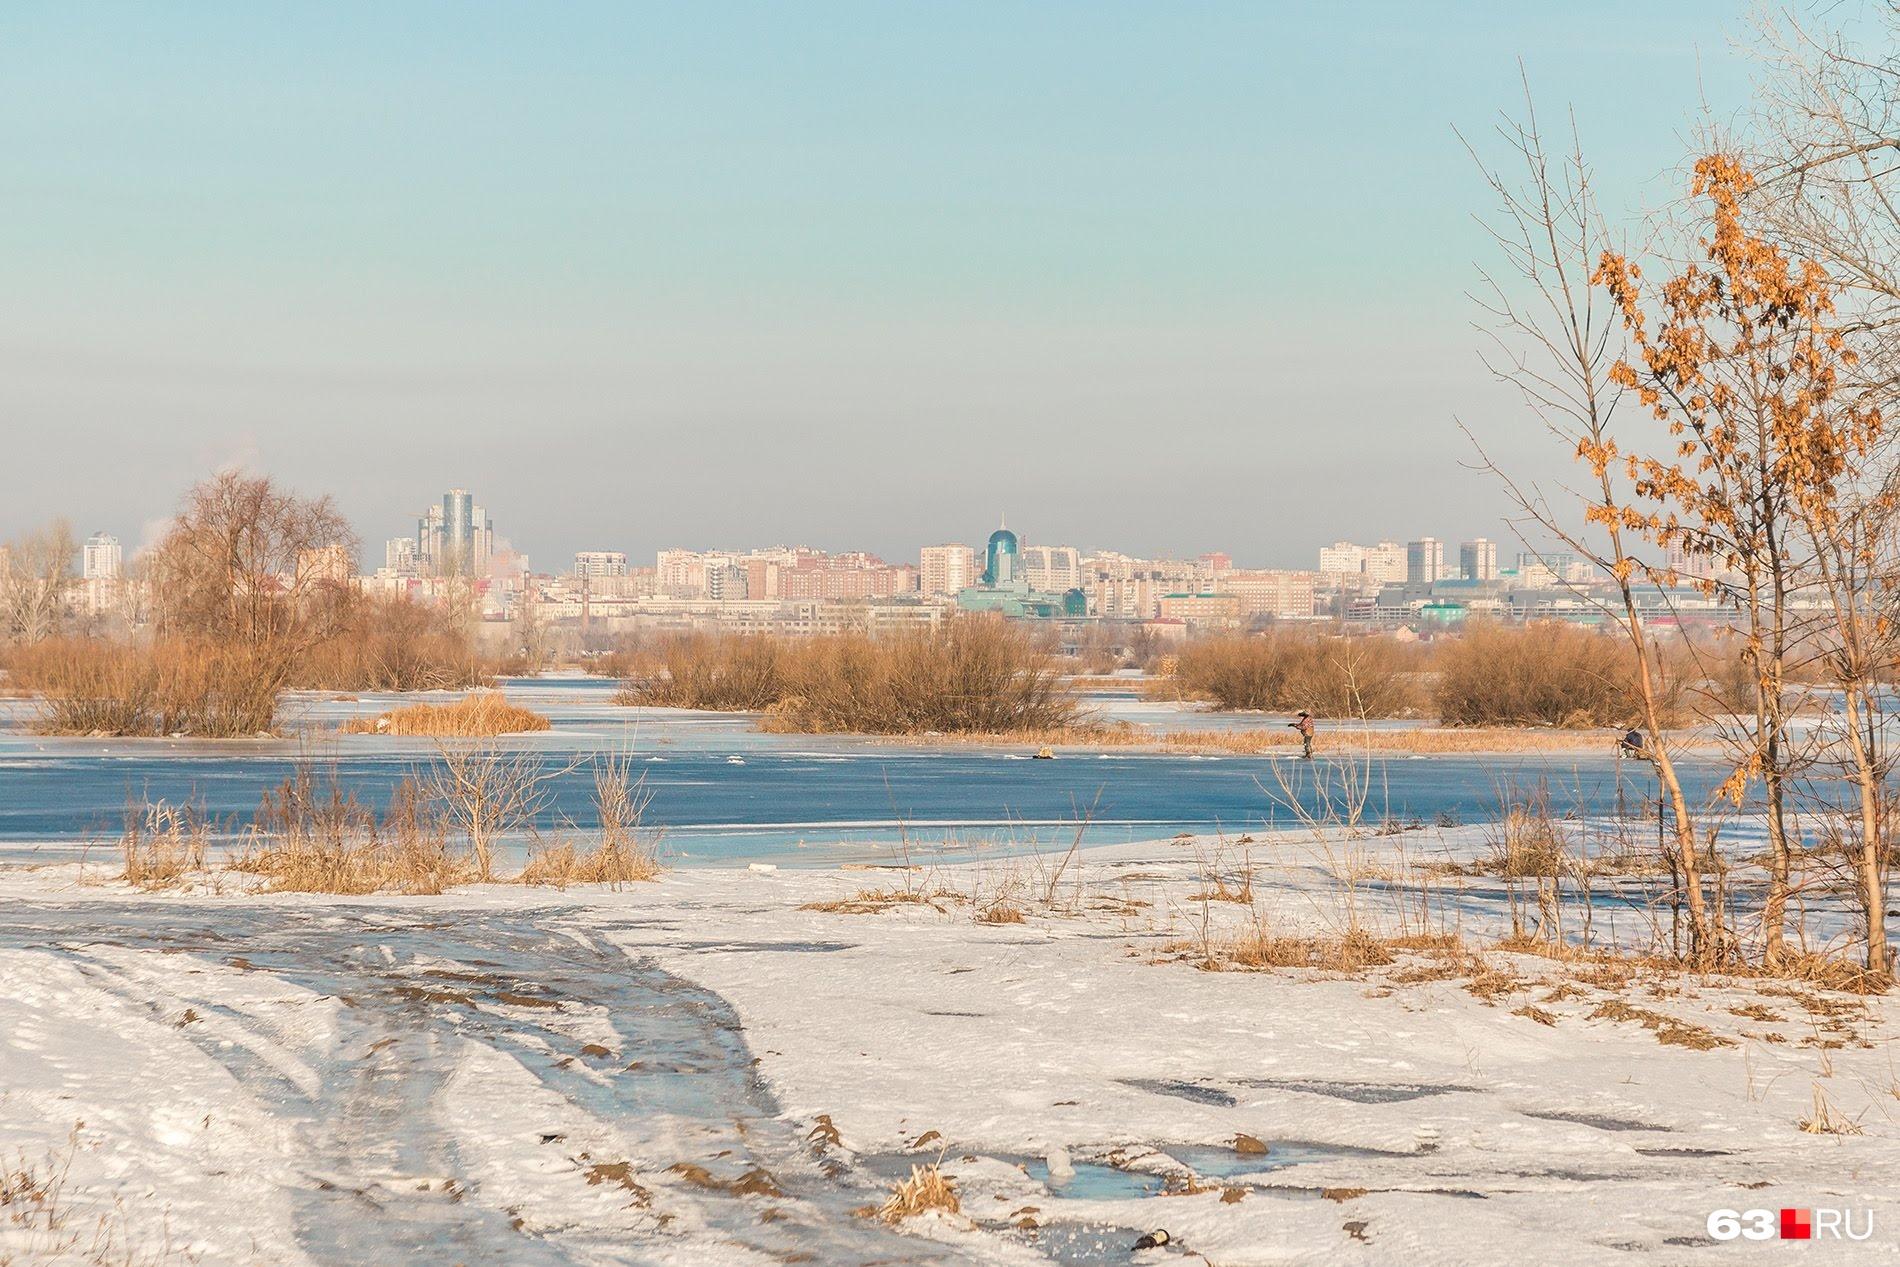 Вид с противополжного берега реки